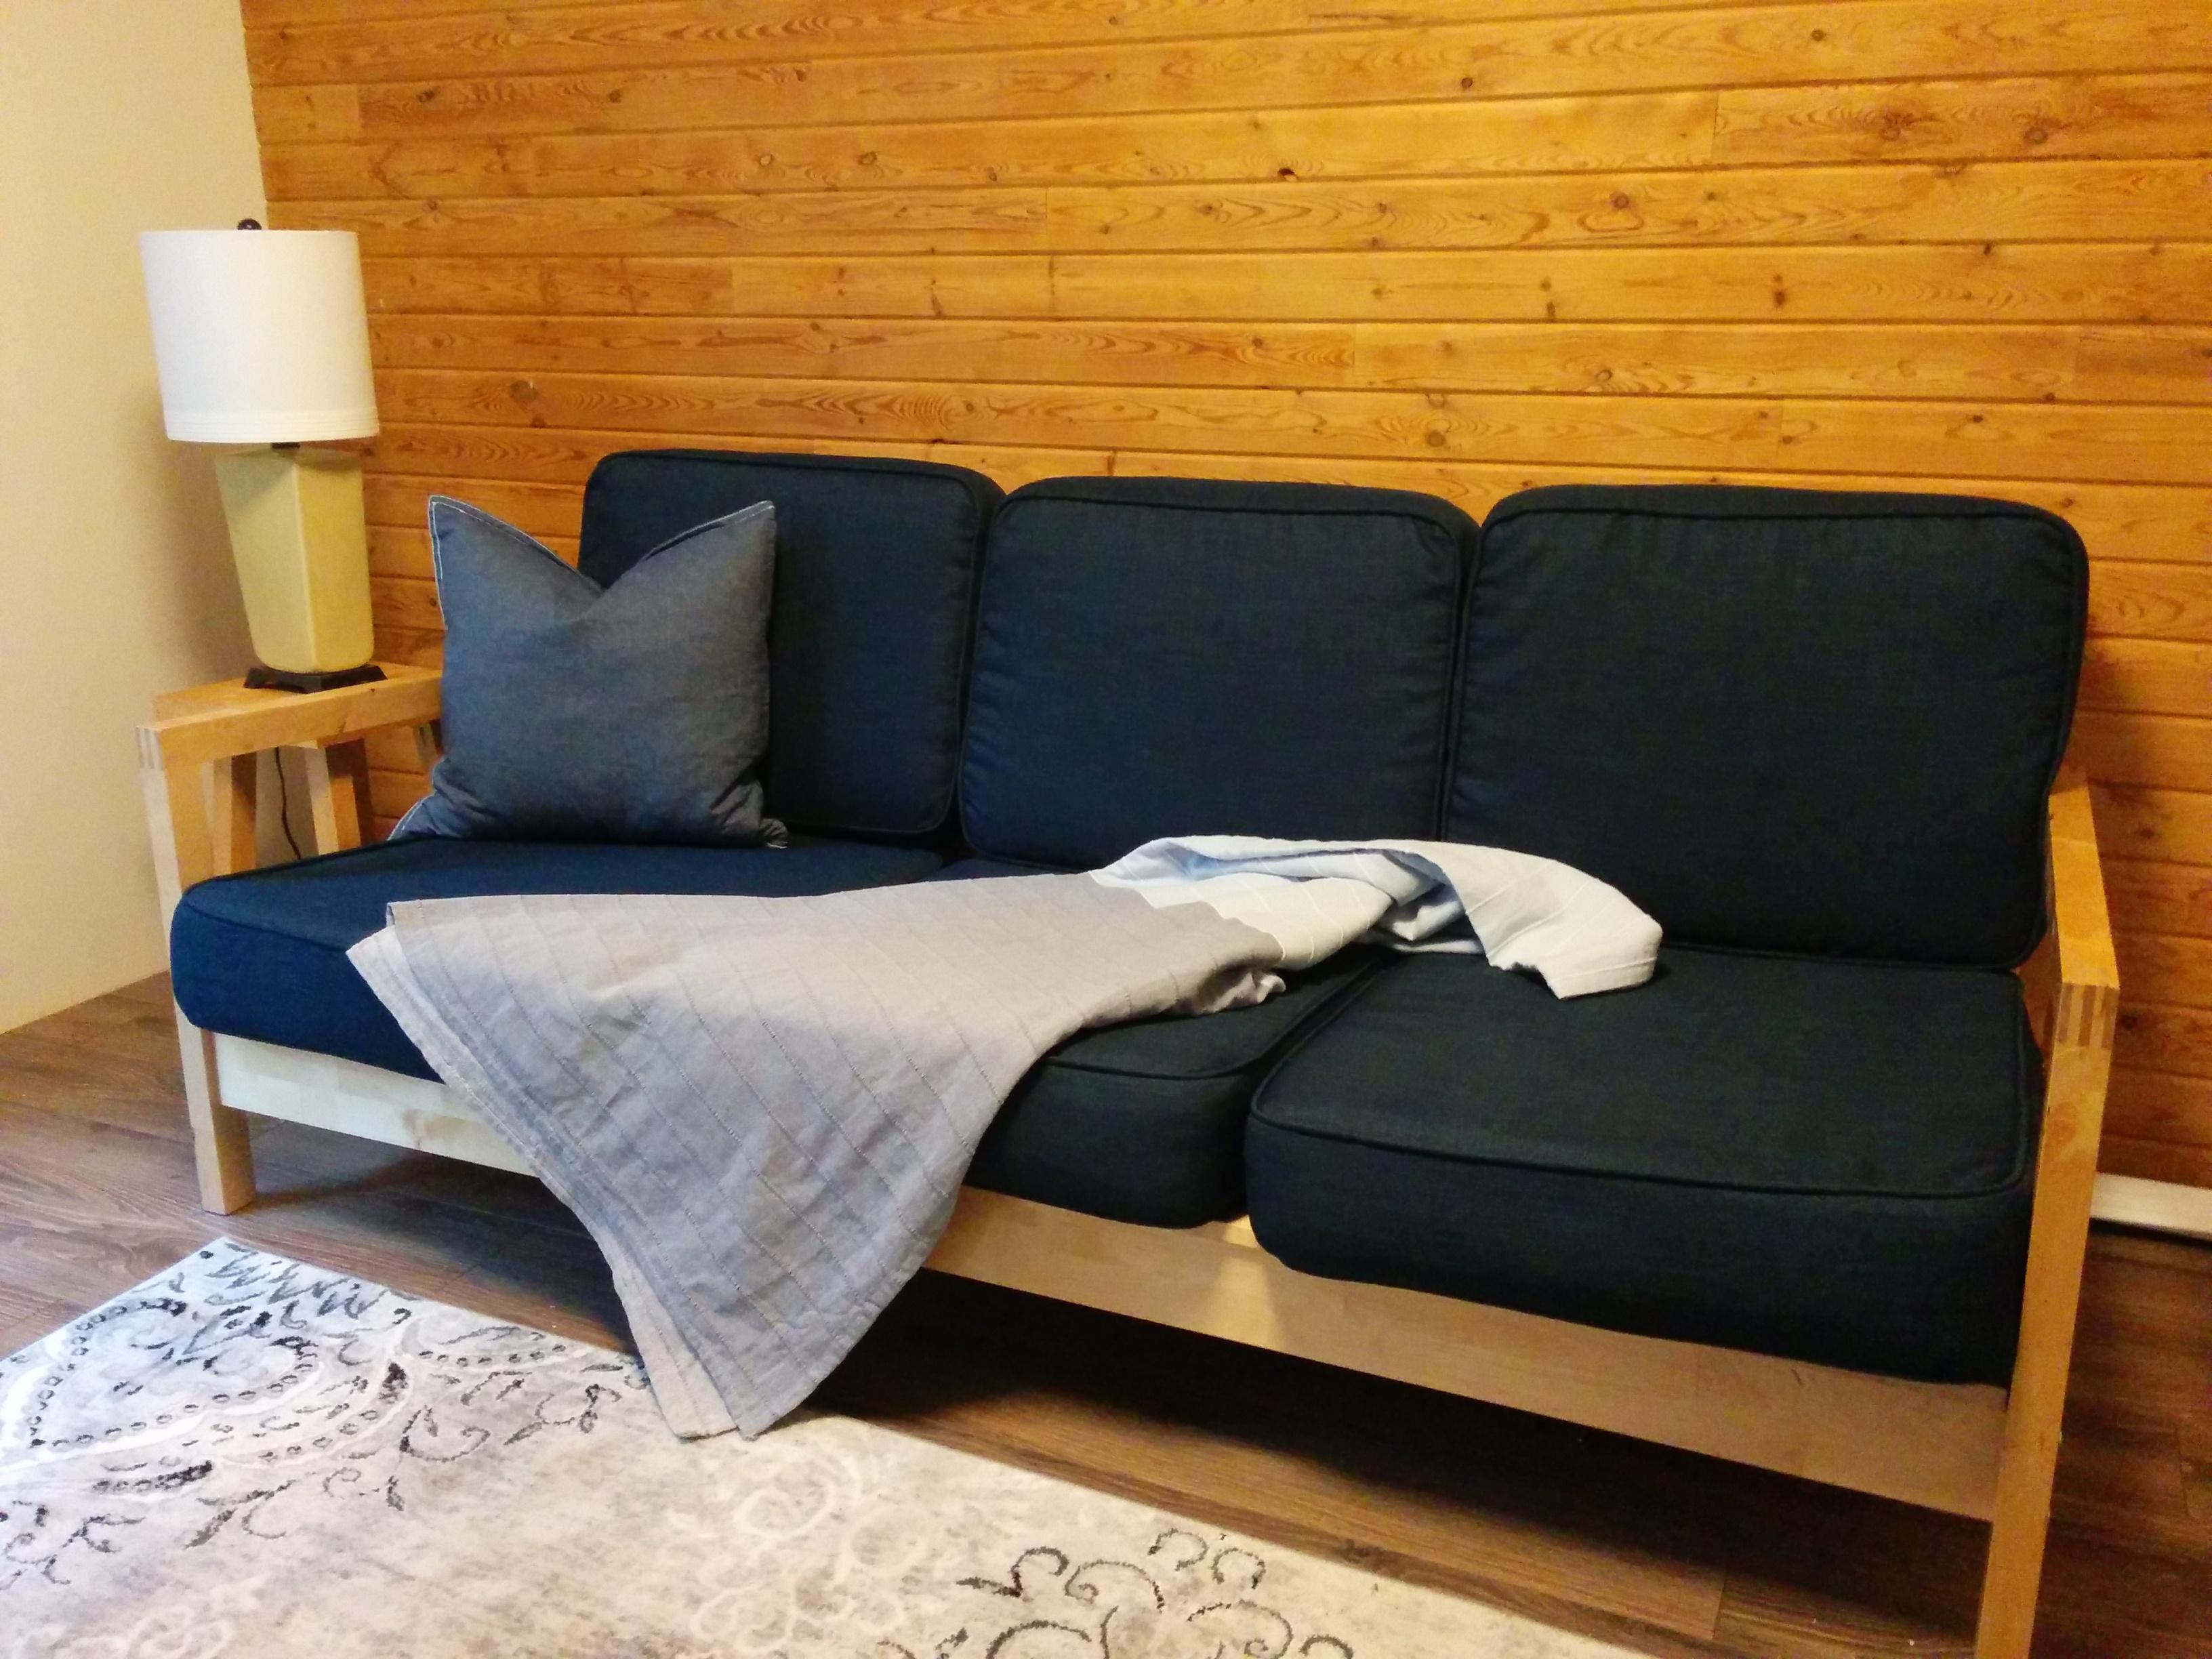 Ikea Lillberg fodera navy blue